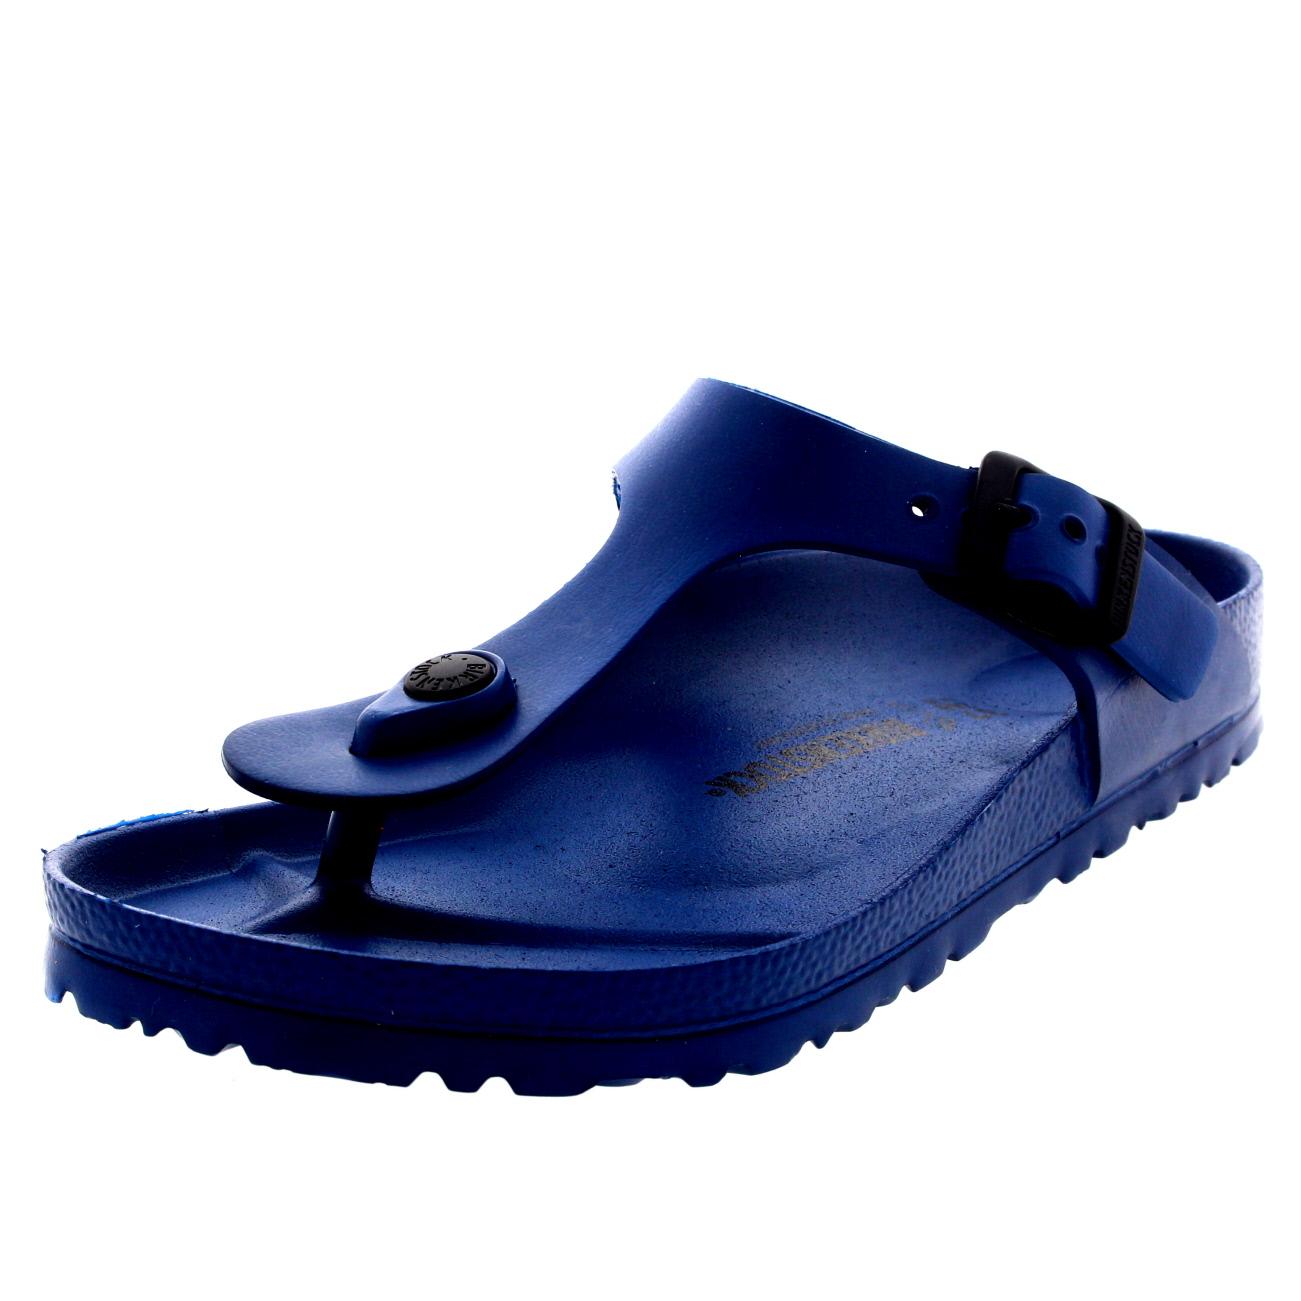 Unisex-Adults-Birkenstock-Gizeh-Summer-EVA-Toe-Post-Beach-Flat-Sandals-All-Sizes thumbnail 22